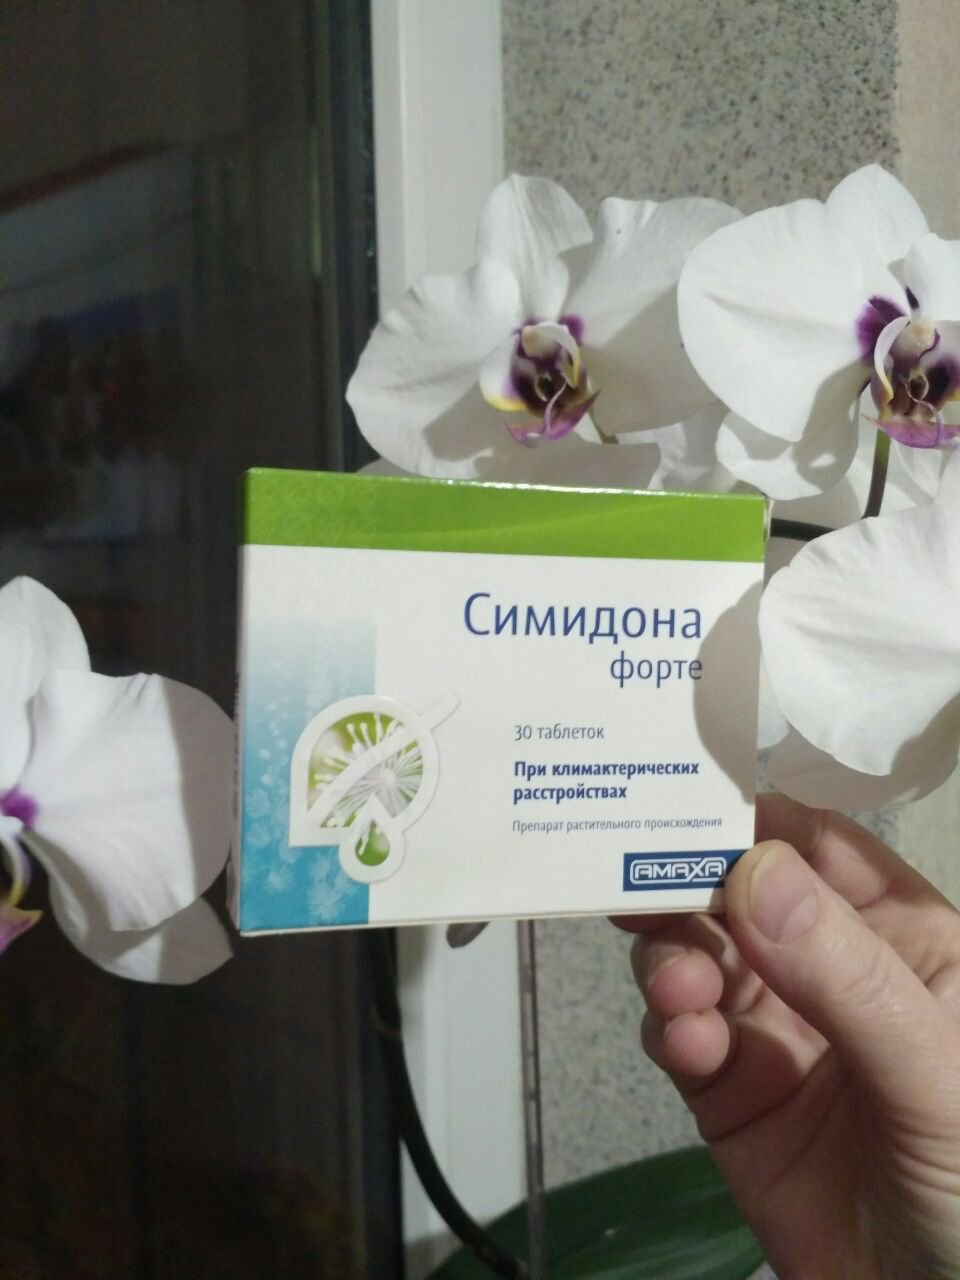 Симидона - препарат для лечения климакса - Климакс -  не приговор!